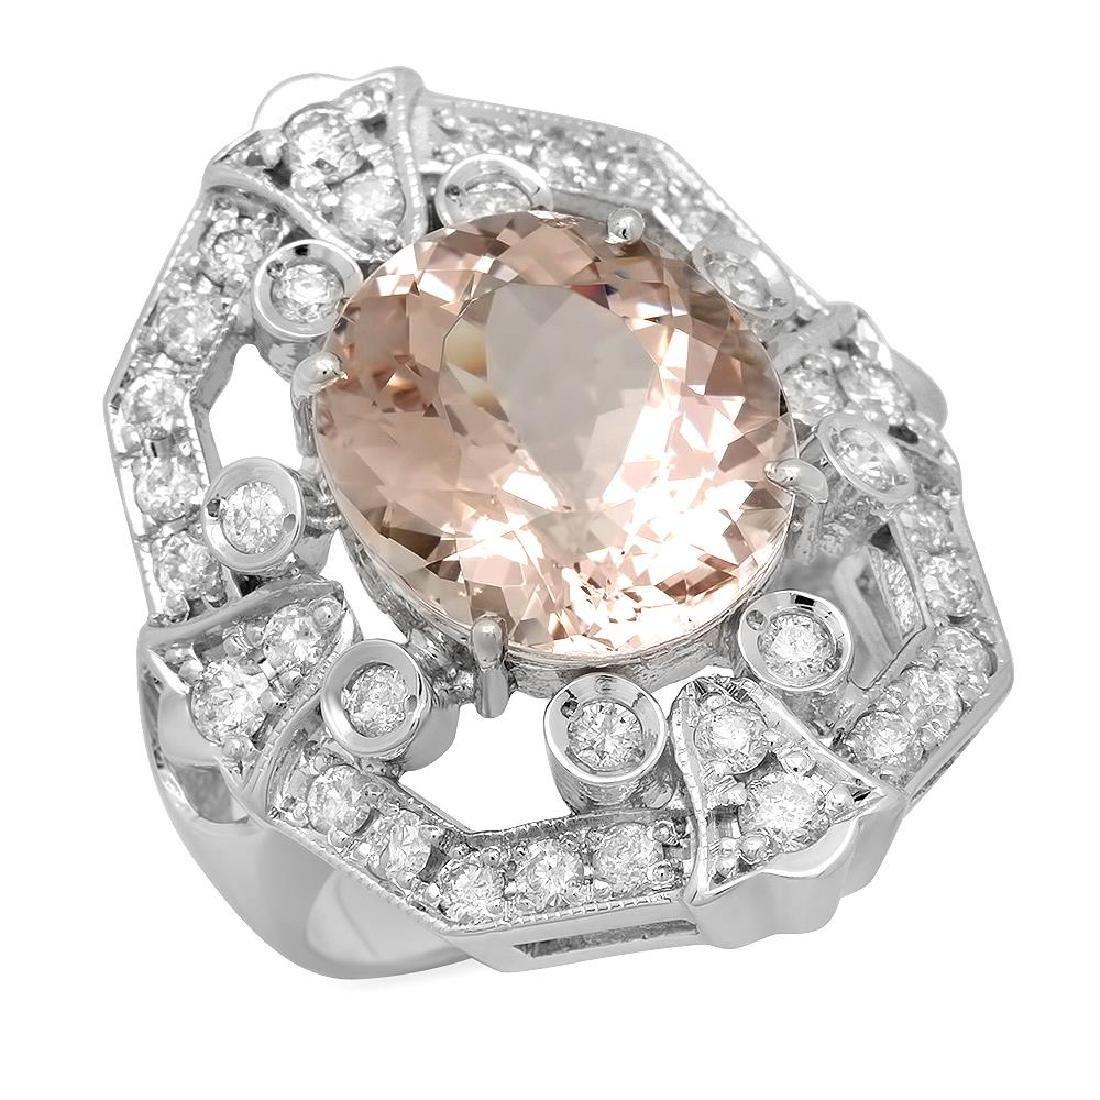 14K Gold 7.28ct Morganite 1.18ct Diamond Ring